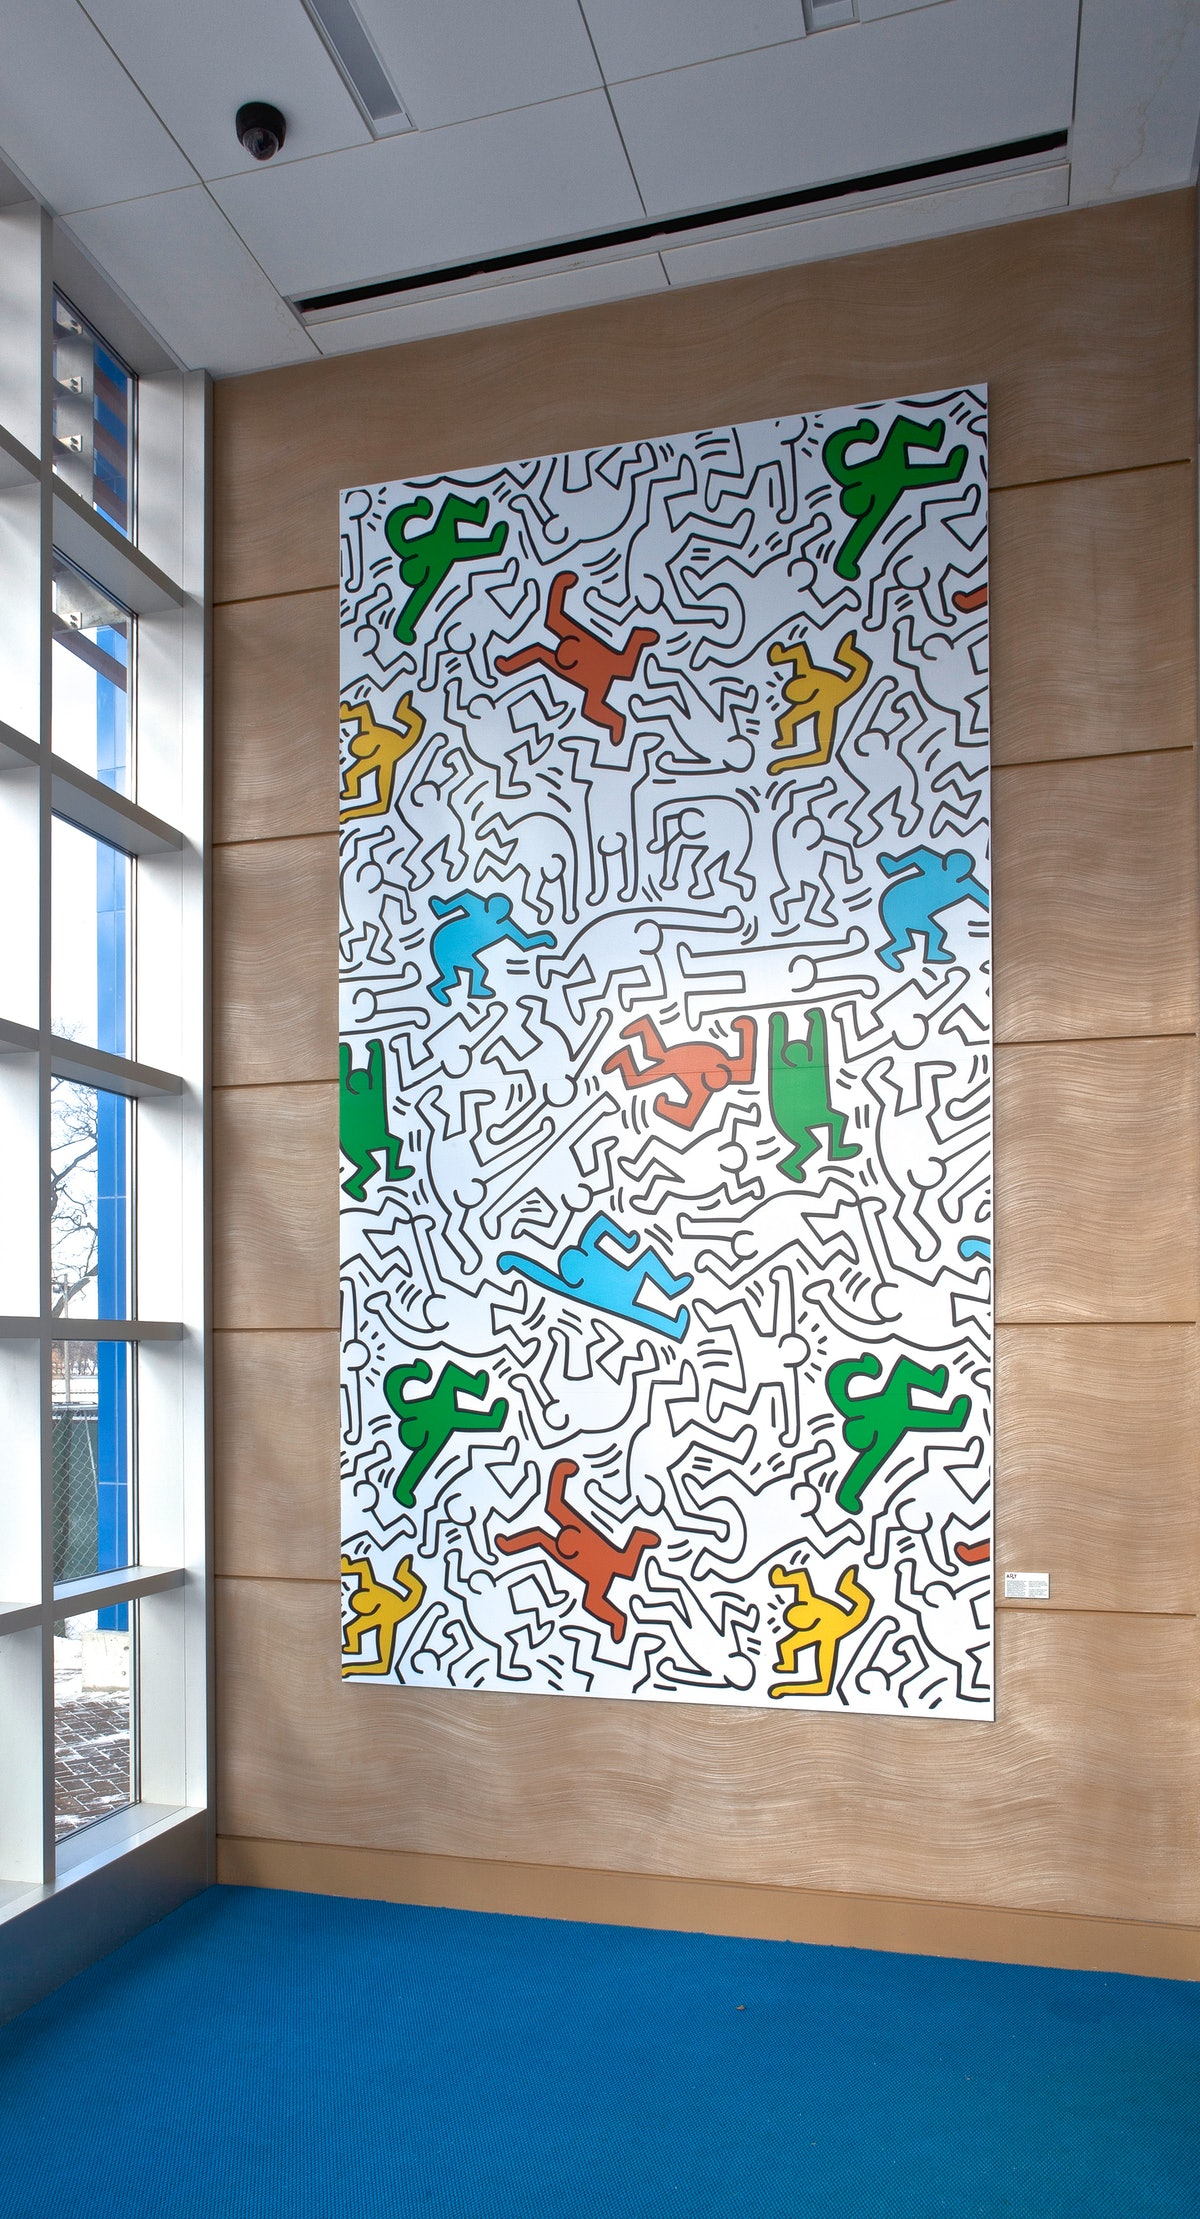 Keith Haring at La Rabida Children's Hospital